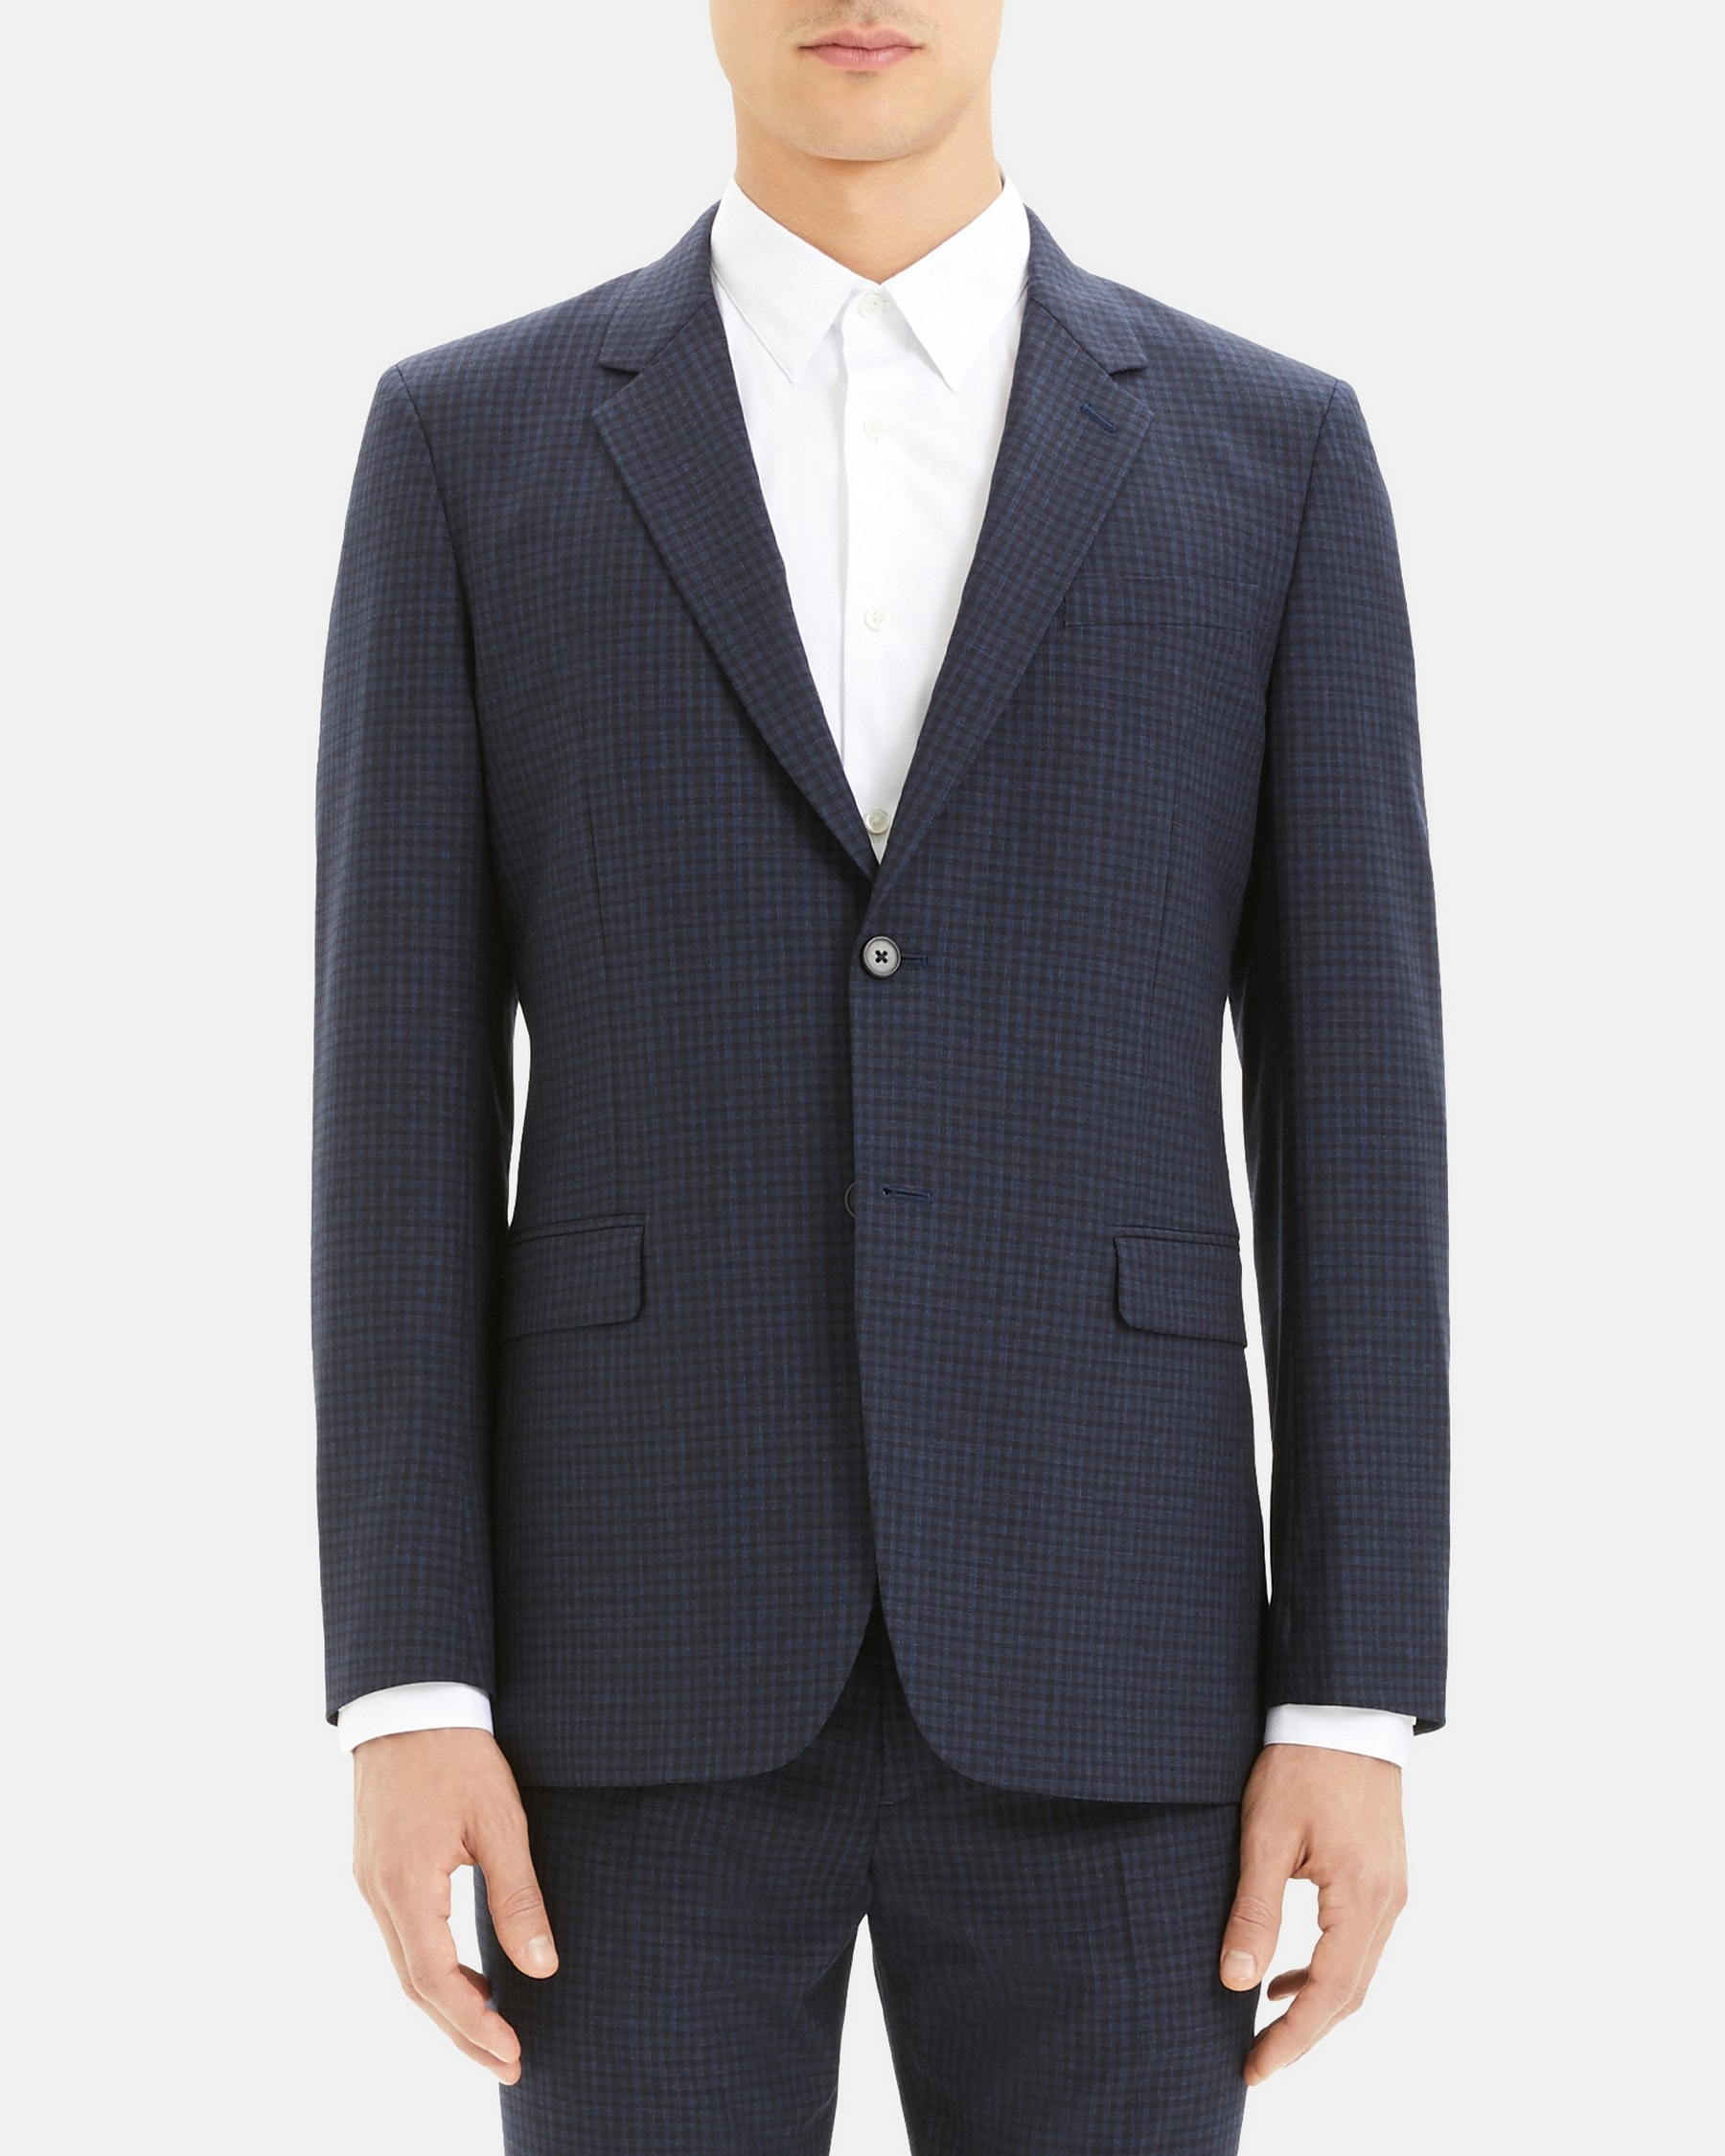 Theory Chambers Blazer in Checkerboard Wool